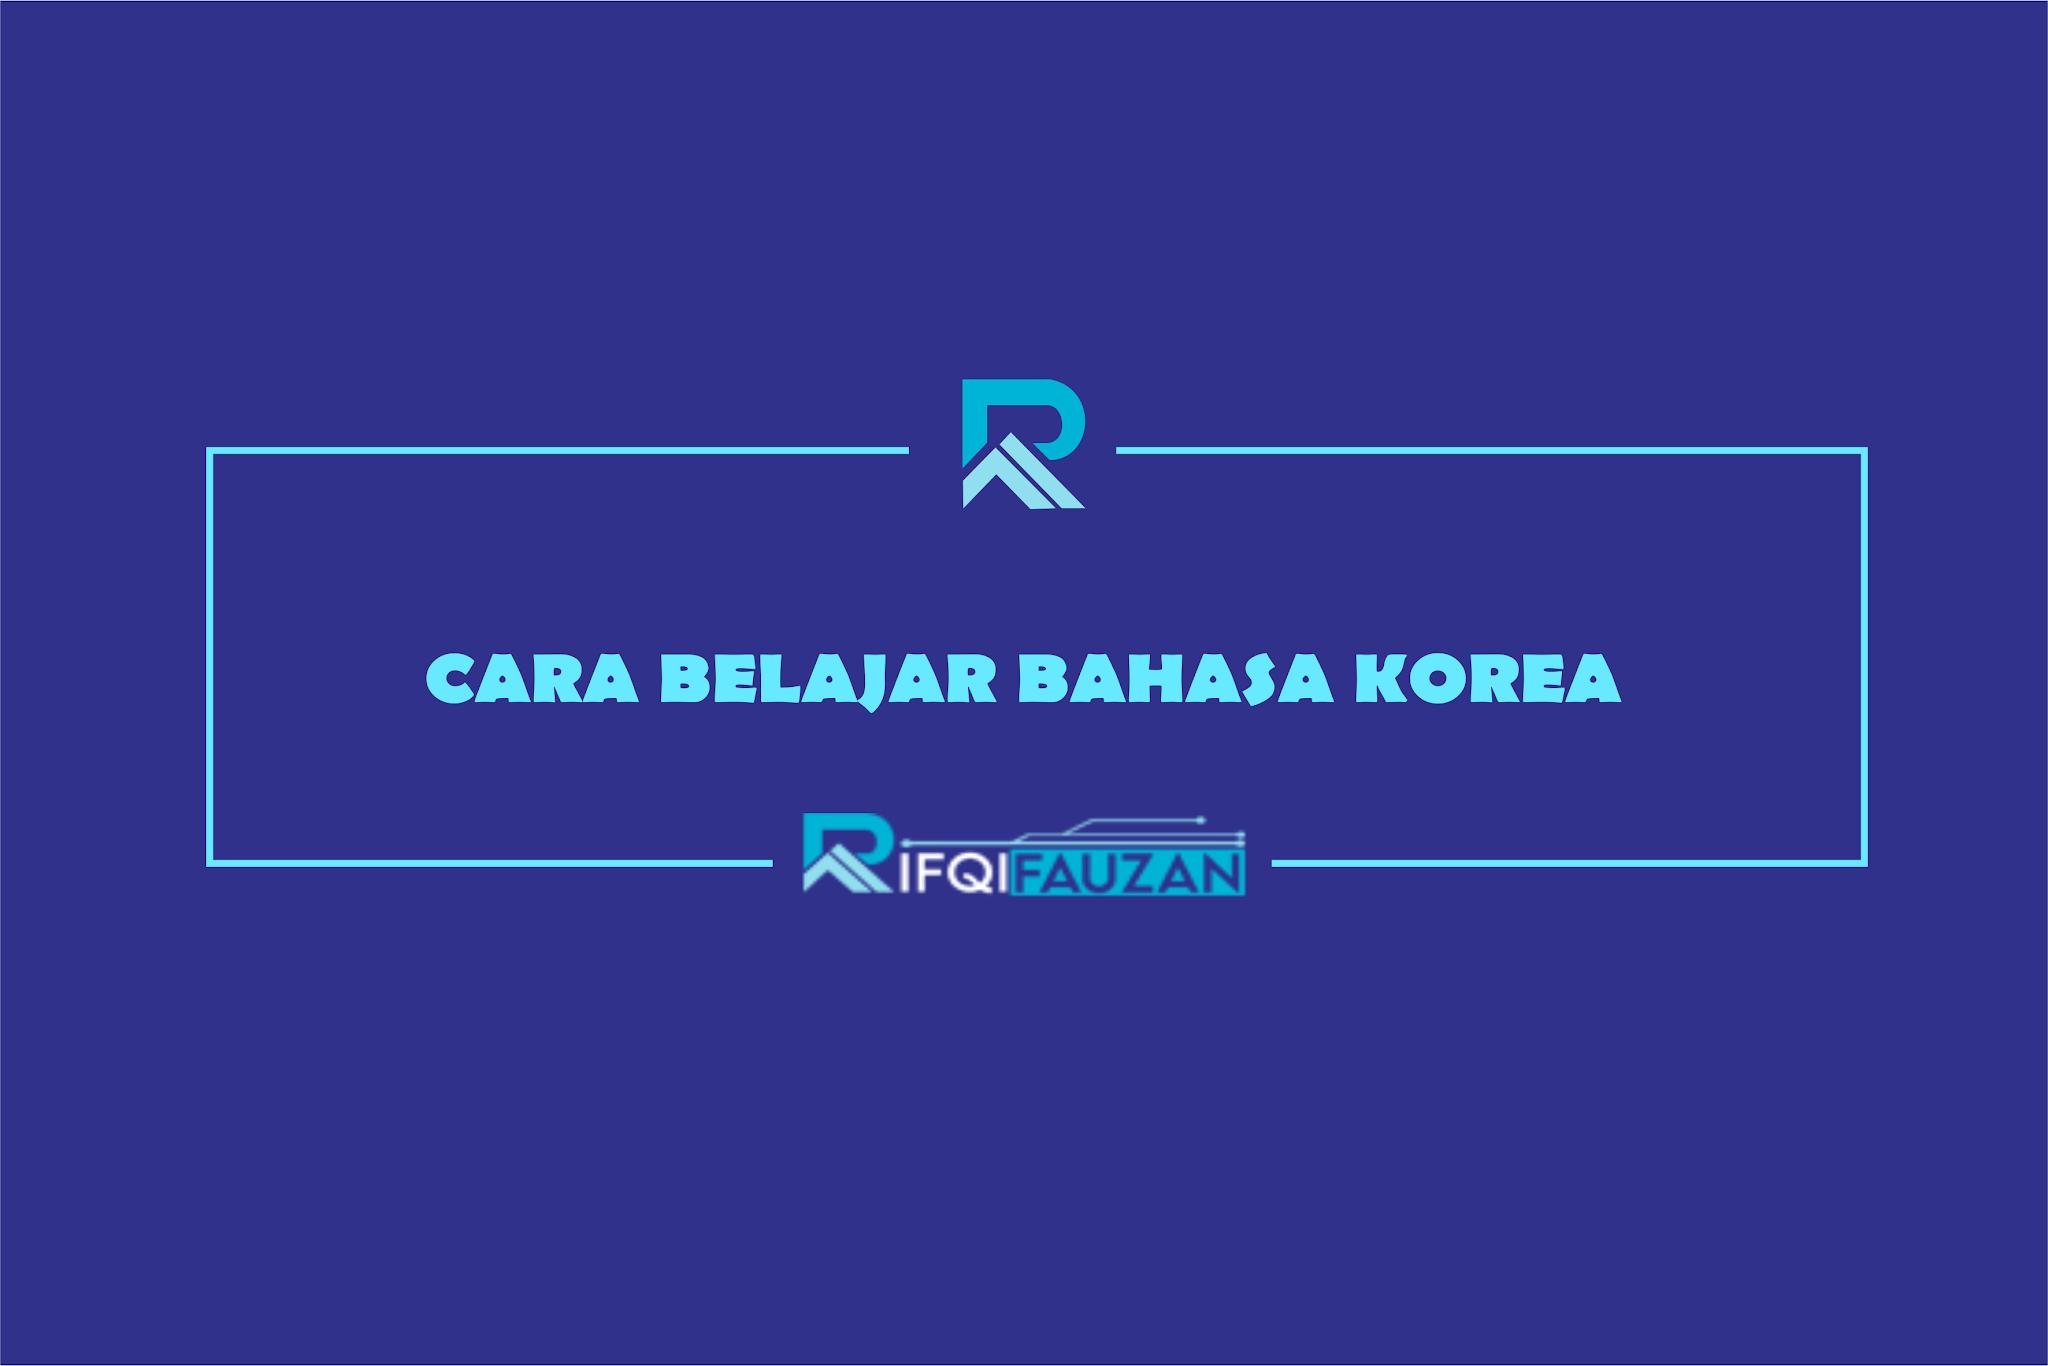 CARA BELAJAR BAHASA KOREA UNTUK PEMULA EFEKTIF DAN CONTOHNYA